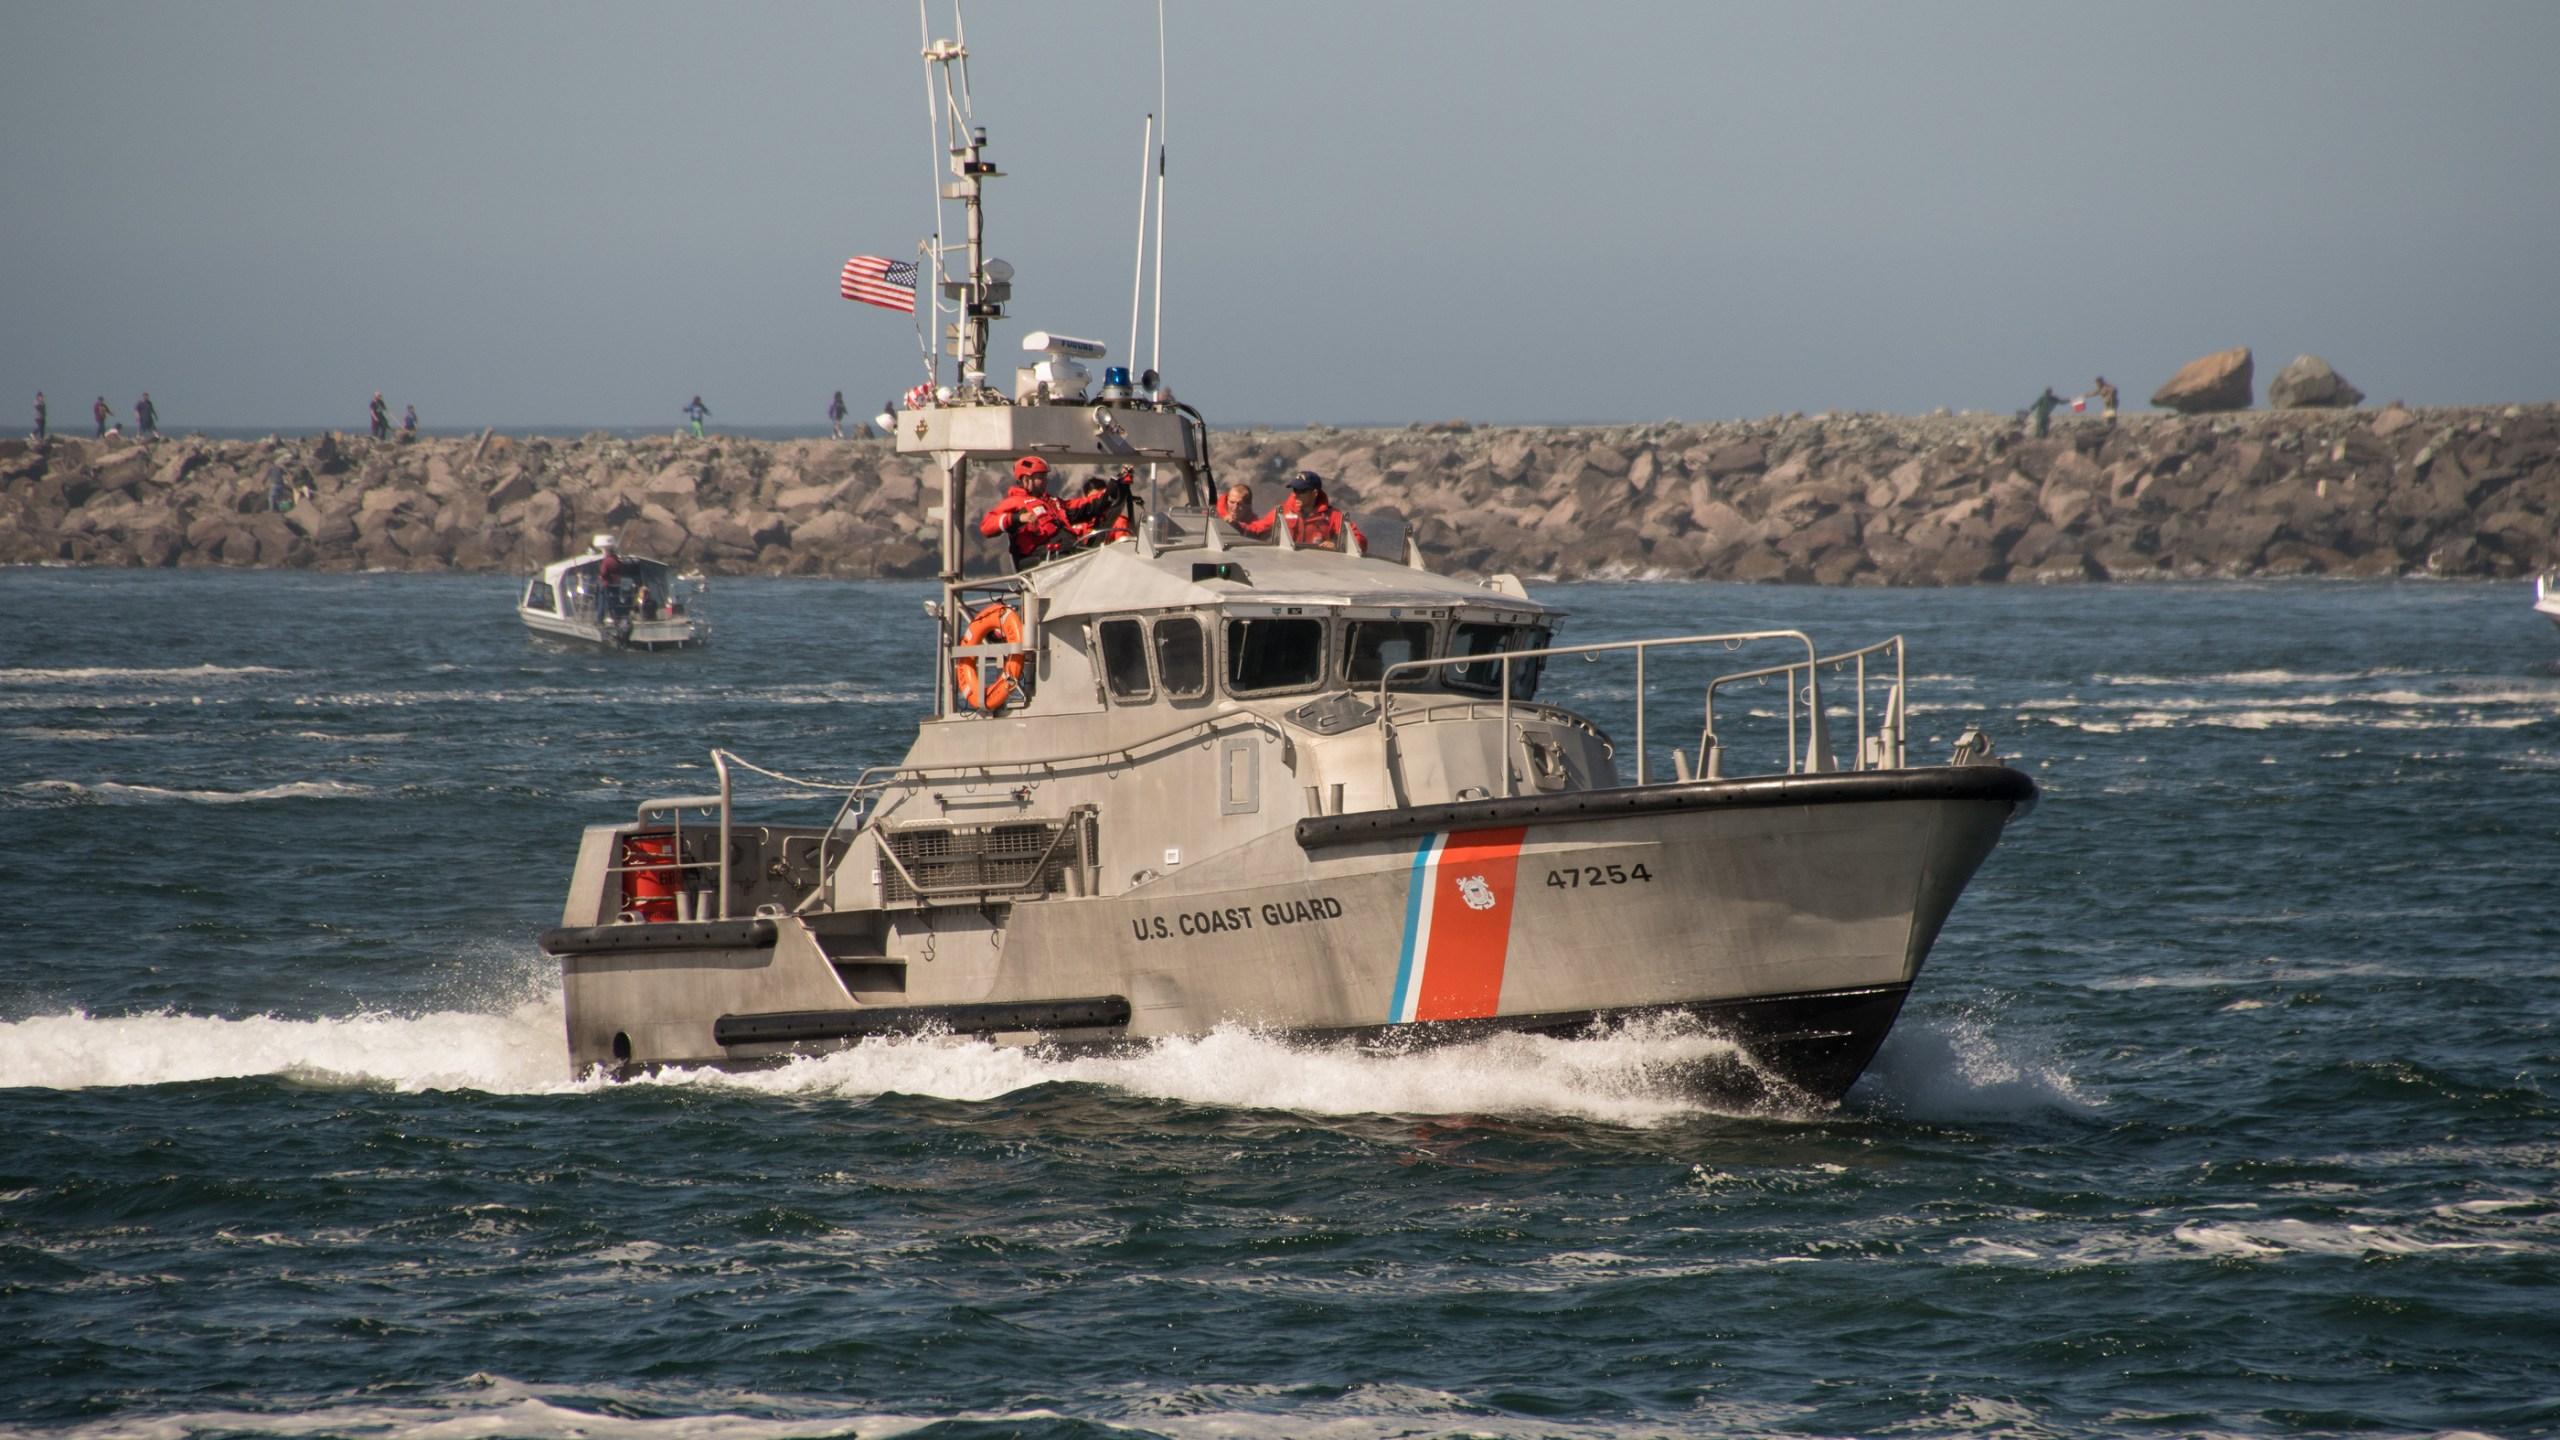 Lawmakers Meet Coast Guard Over Academy Harassment Concerns